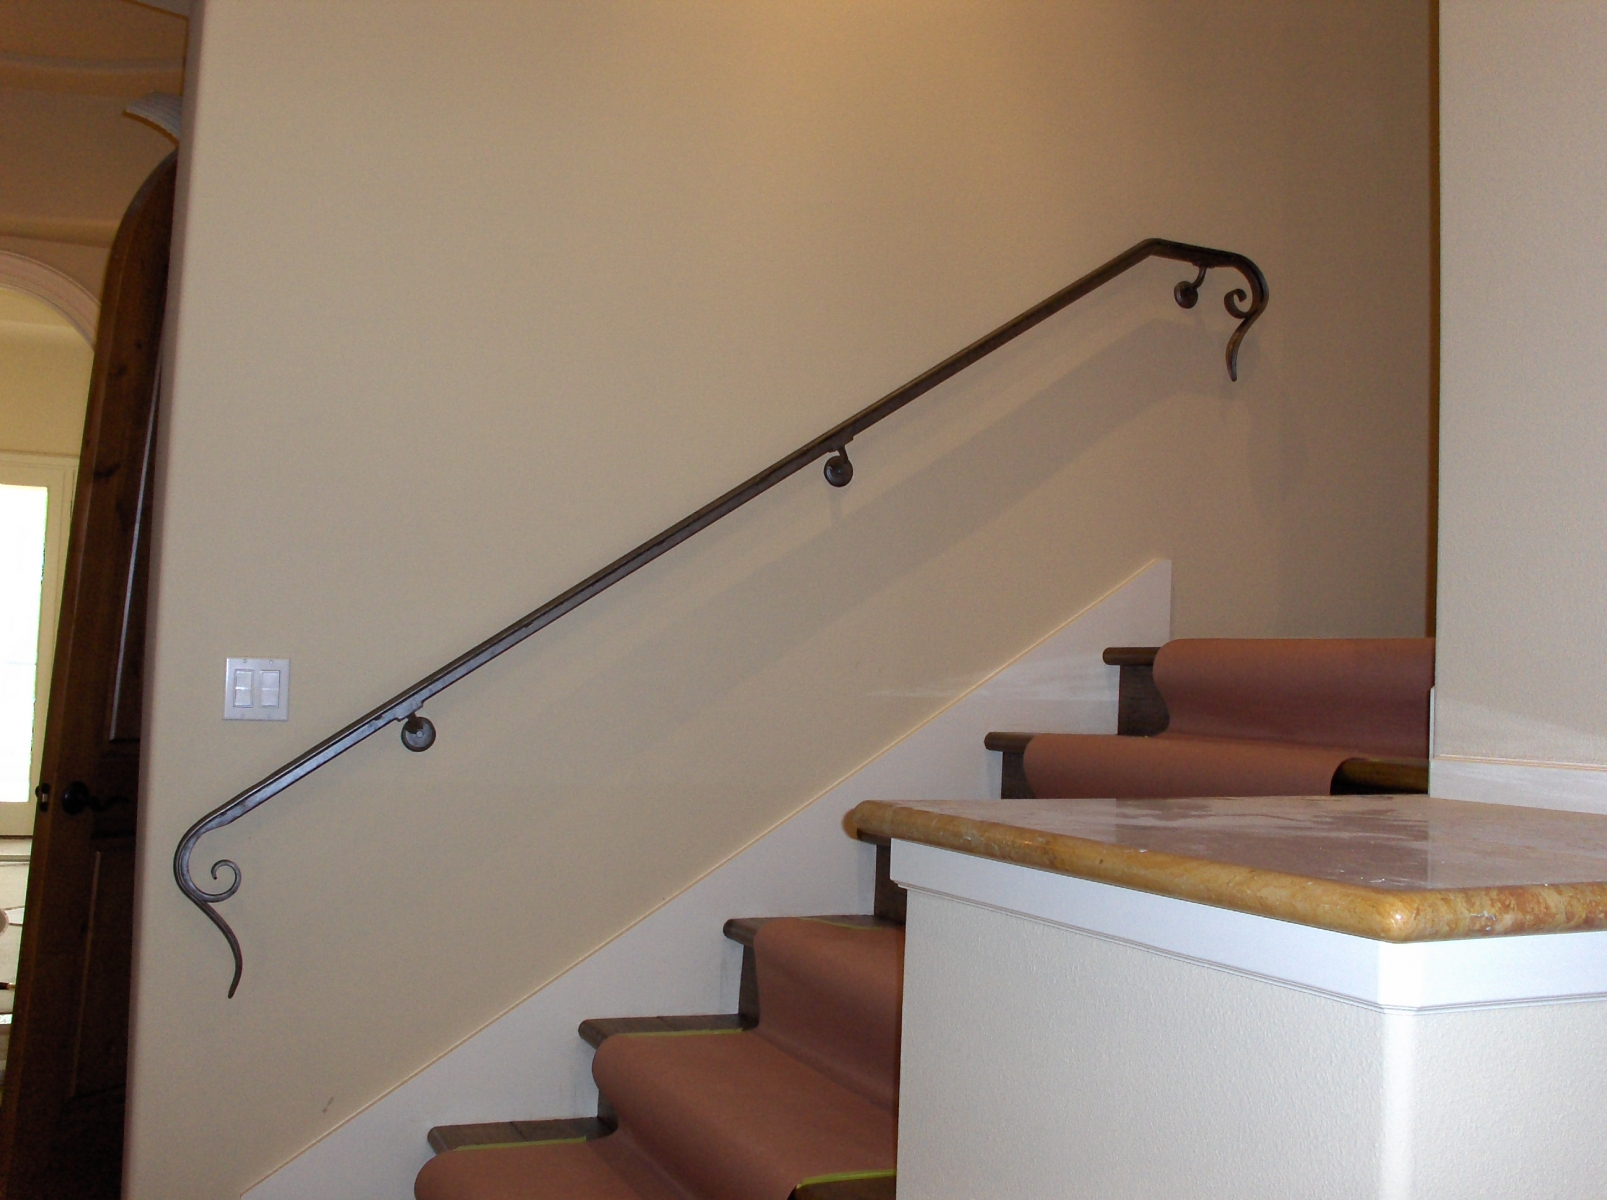 stairrailinghandrail0025